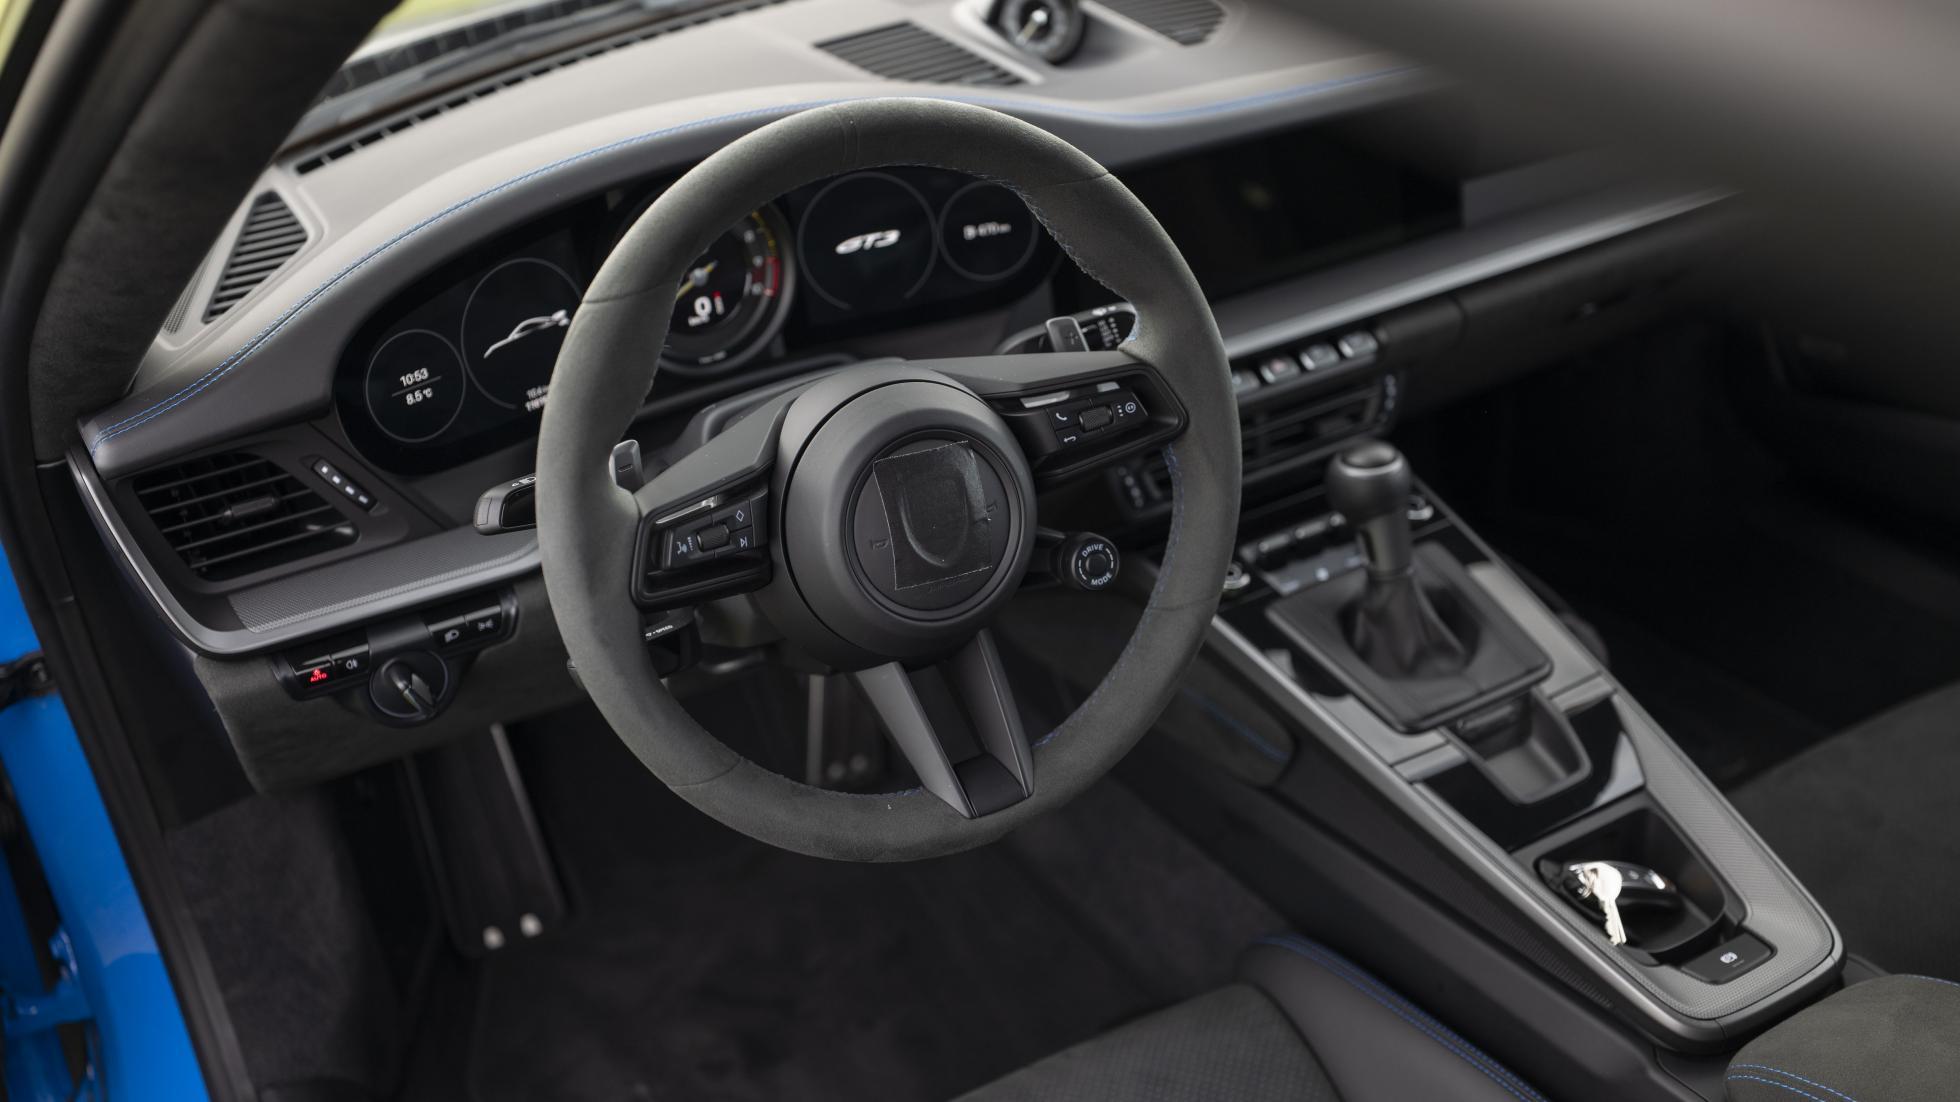 Porsche-911-GT3-RS-interior